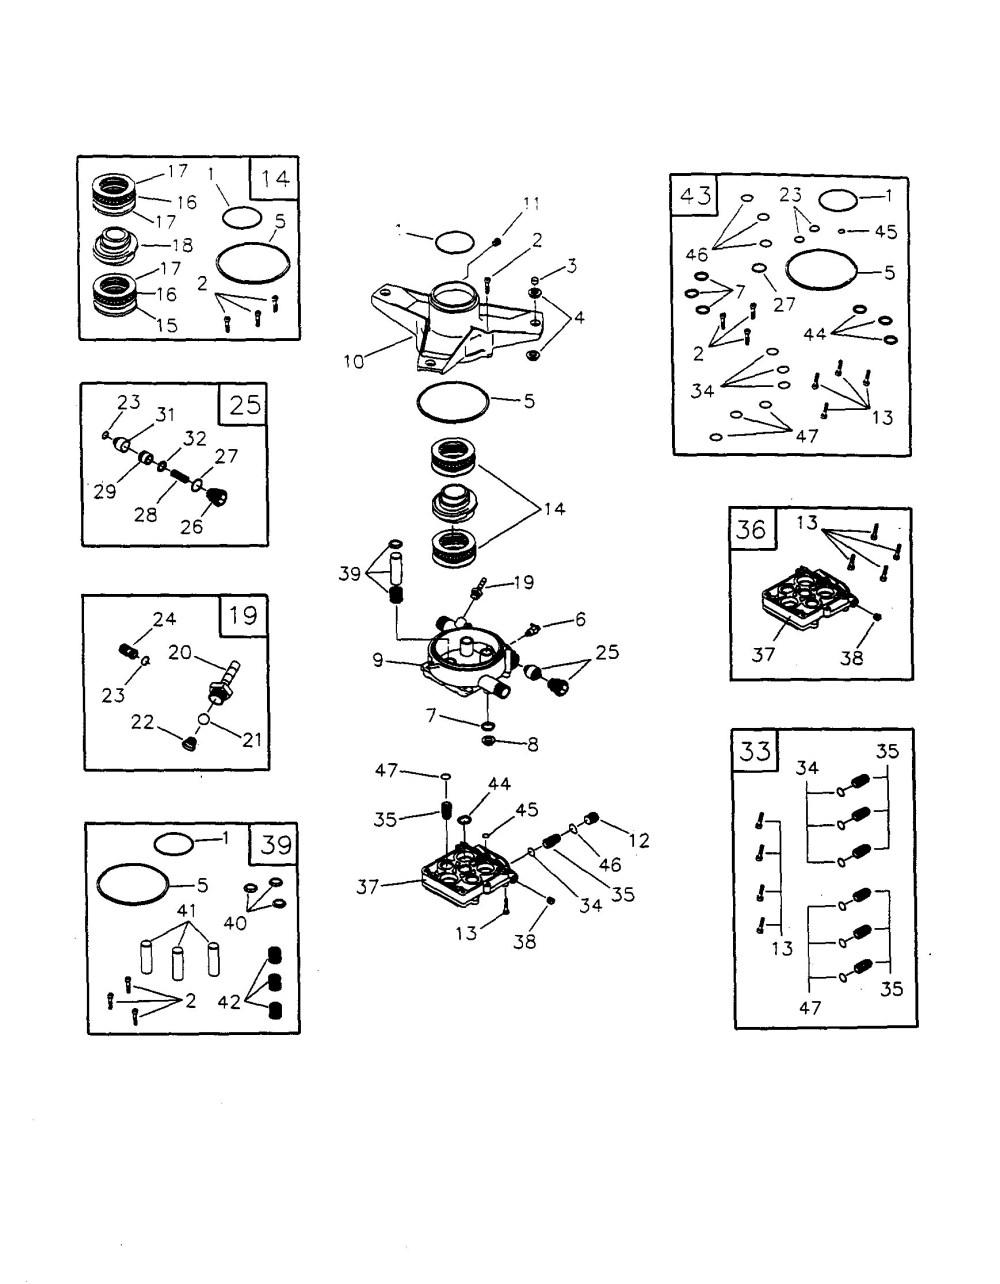 medium resolution of honda gcv160 engine parts diagram reviewmotors cohonda gcv160 engine parts diagram gc160